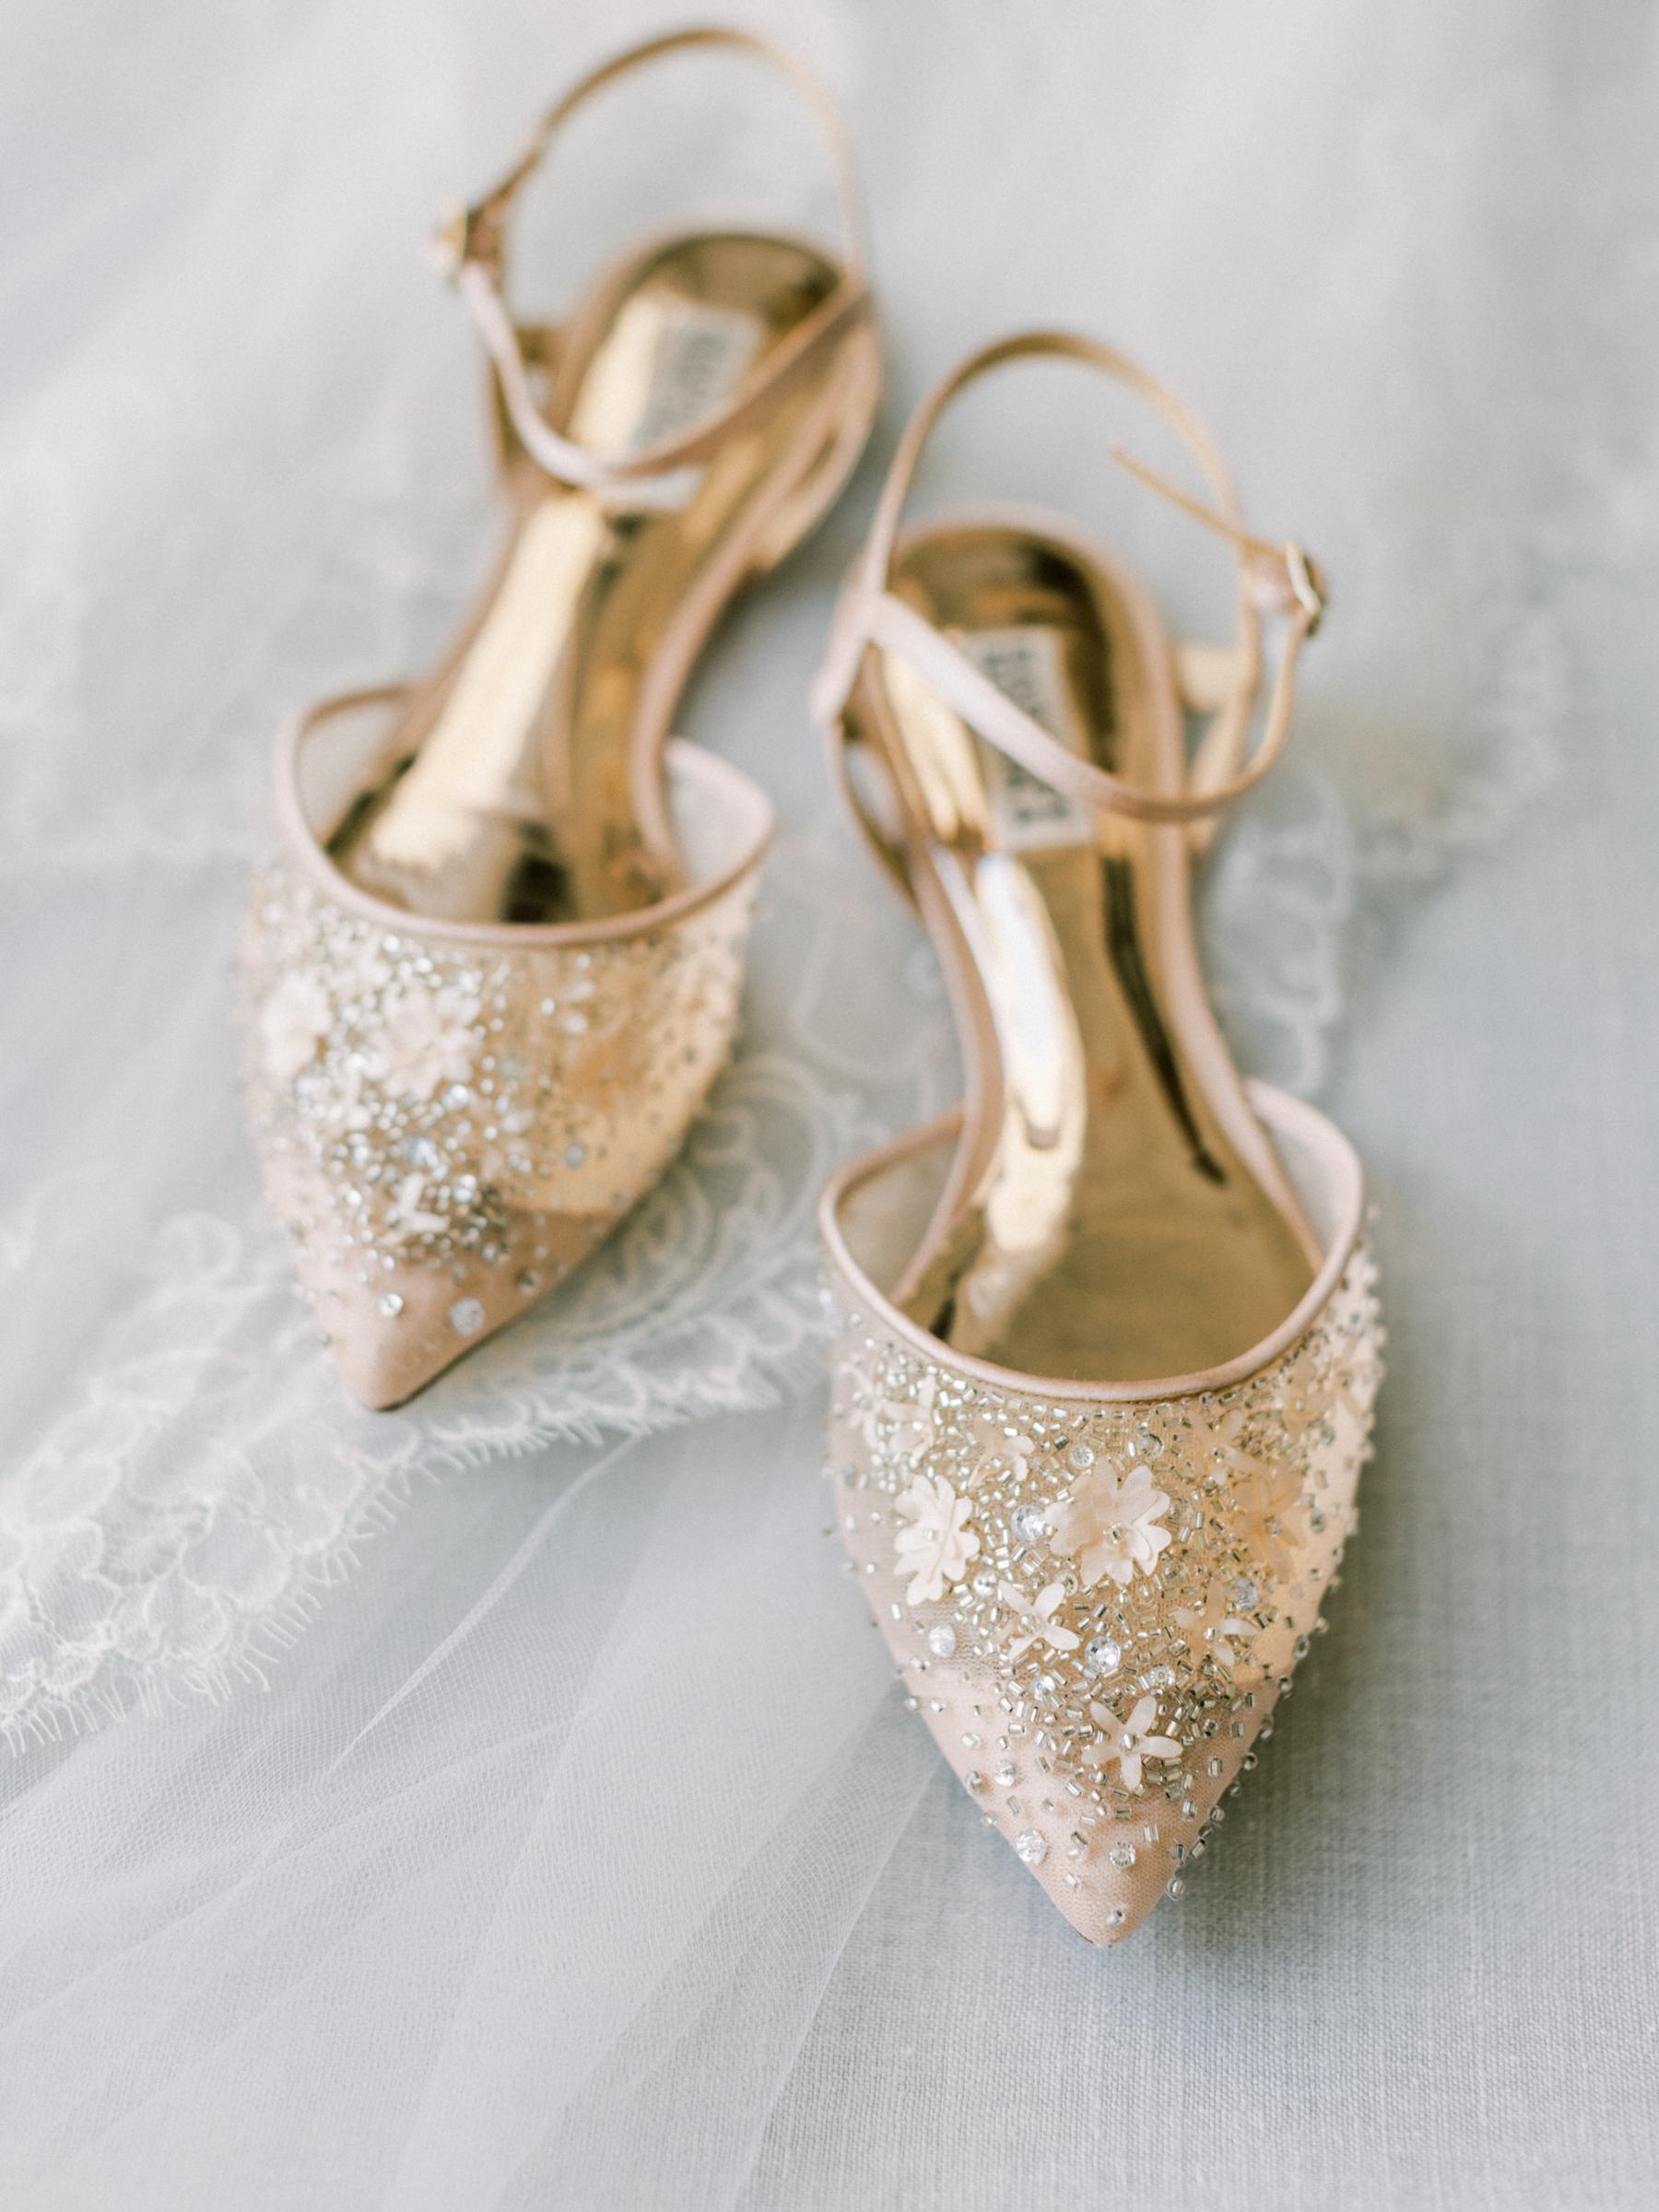 Embellished Badgley Mischka bridal shoes